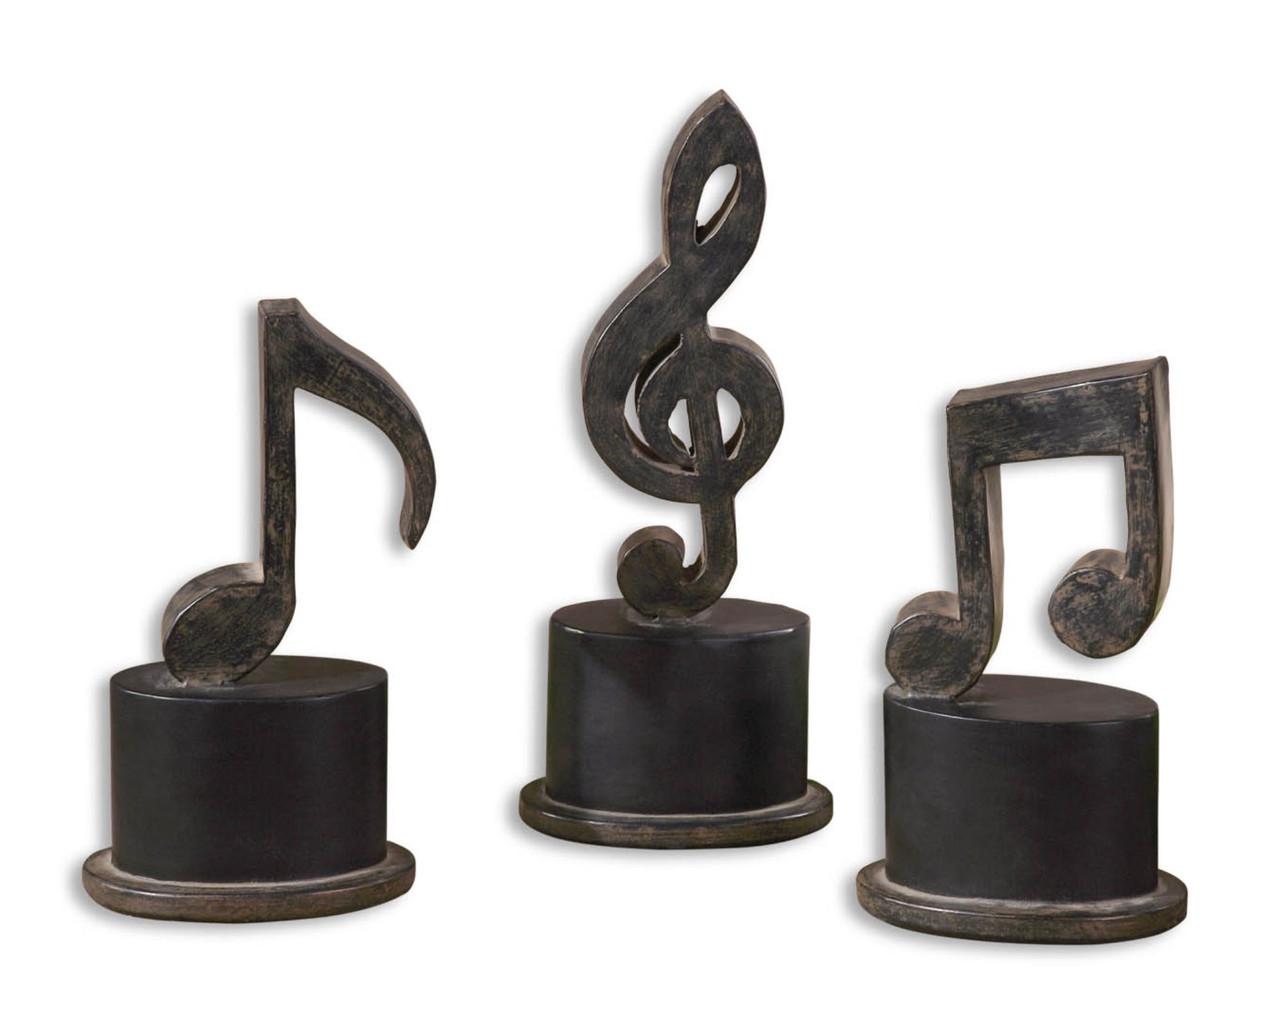 Set of 3 Matte Black & Tan Metal Instrumental Music Note Table Top ...